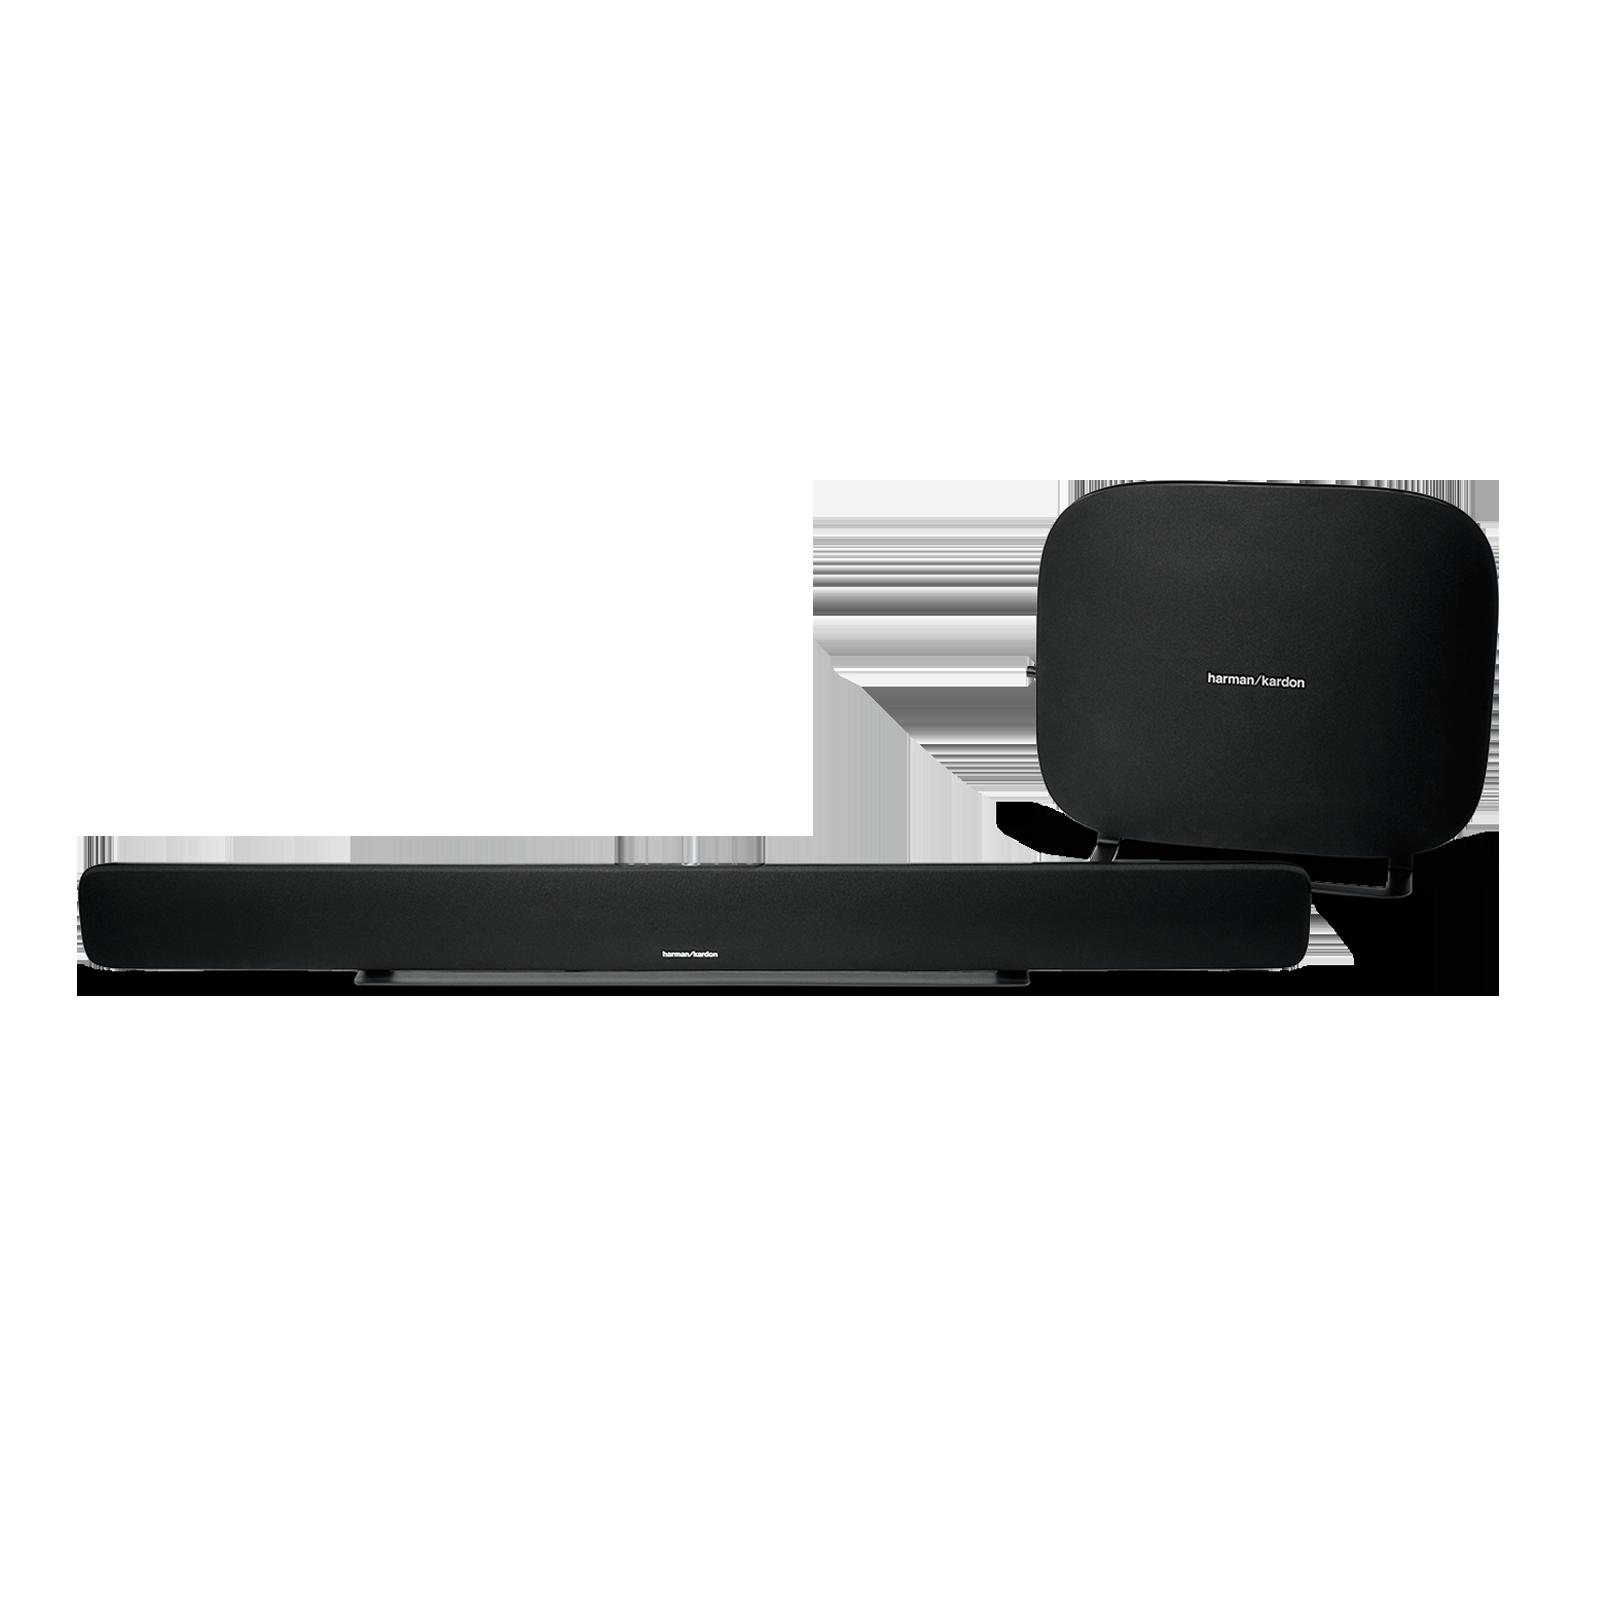 Omni Bar Plus - Black - Wireless HD Soundbar - Hero